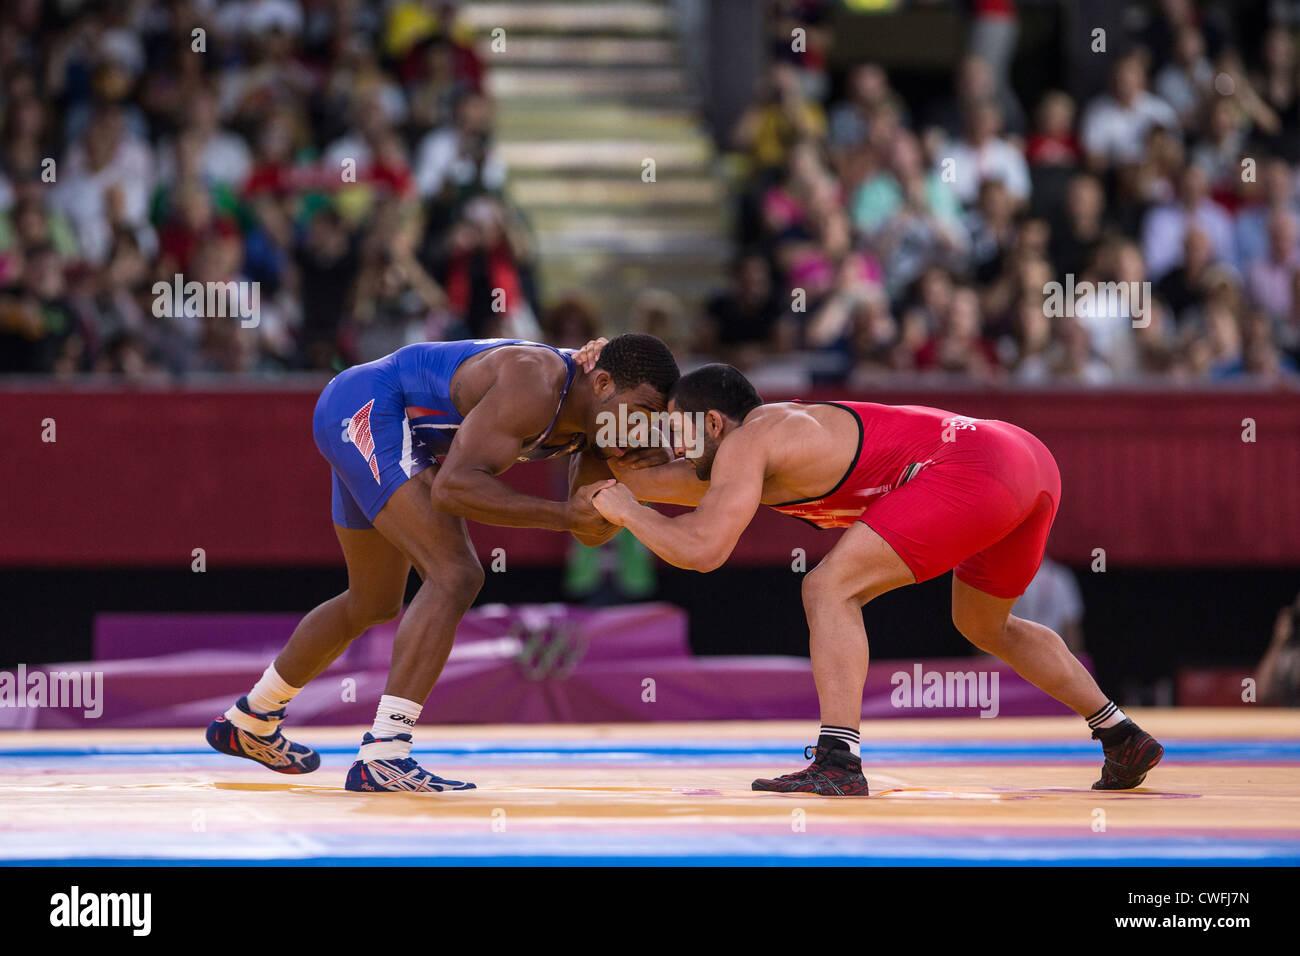 La Jordanie Ernest Burroughs (USA) -B- vs Sadegh Saeed Goudarzi (IRI) en 74kg lutte libre aux Jeux Olympiques Photo Stock